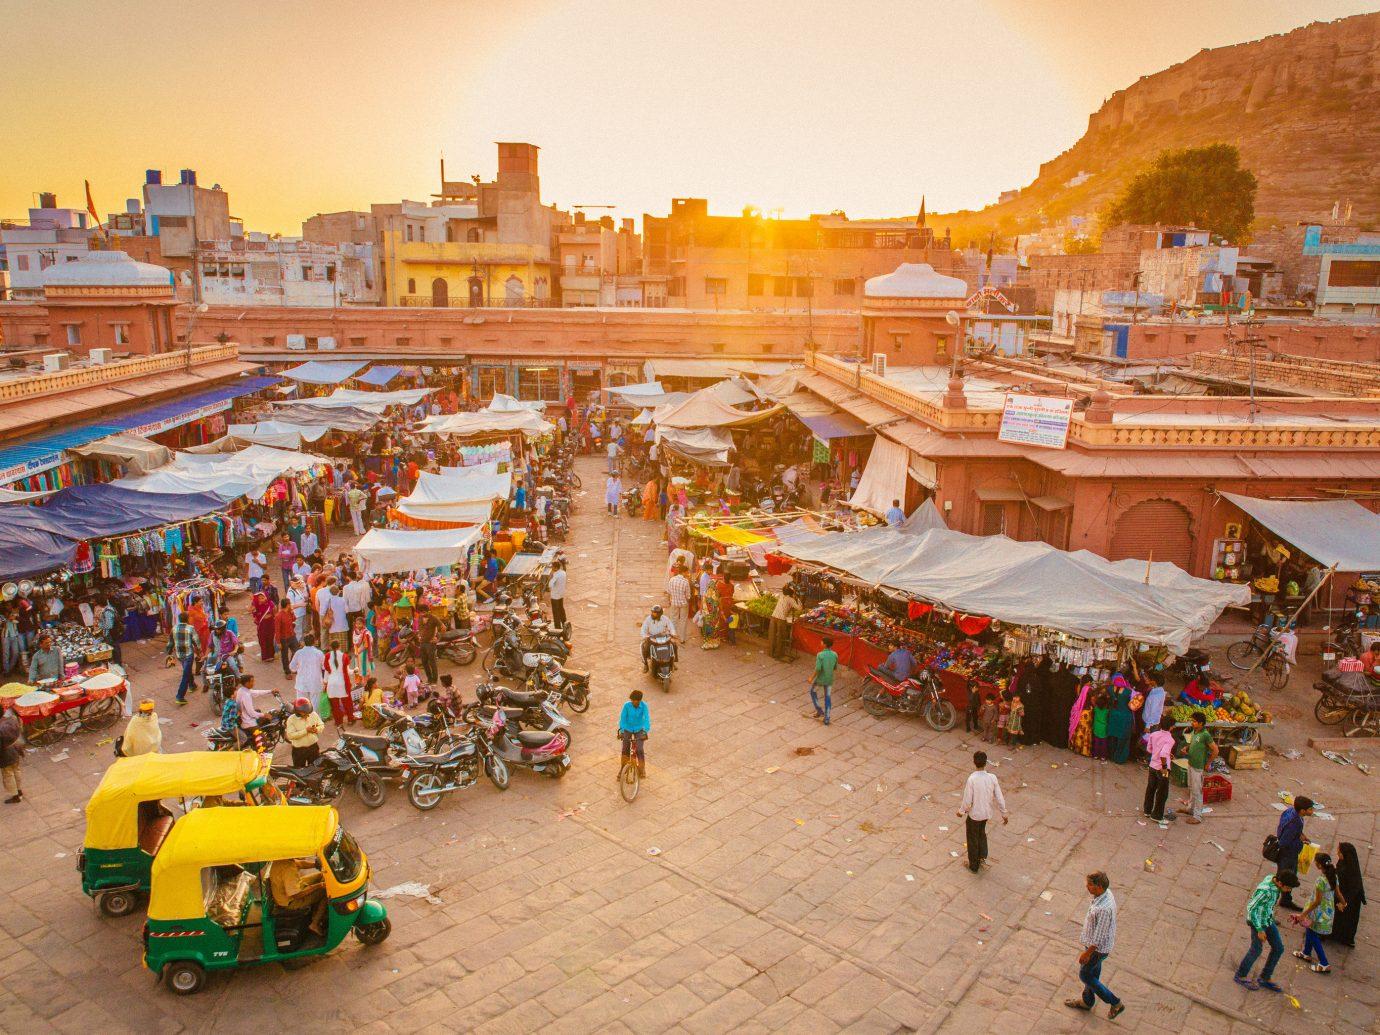 India Jaipur Jodhpur Trip Ideas sky ground toy outdoor City tourism marketplace people group recreation fair leisure sand market several